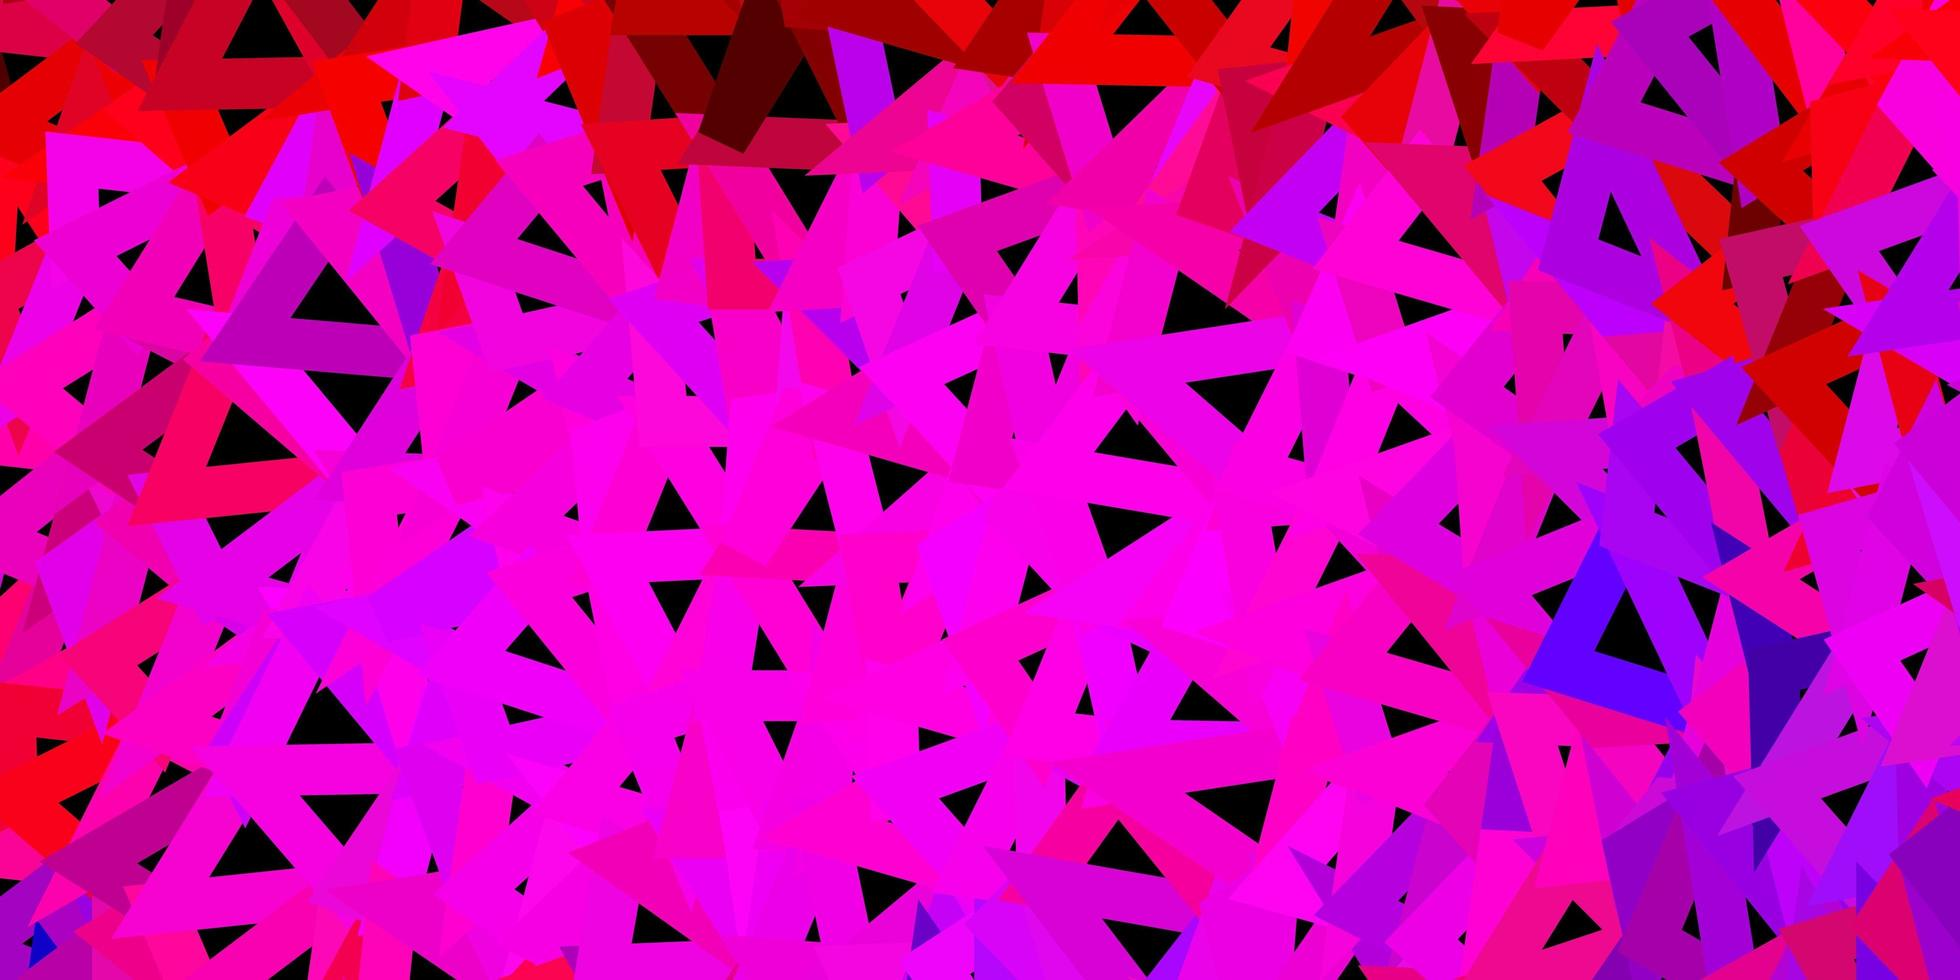 hellrosa, rote Vektor geometrische polygonale Tapete.